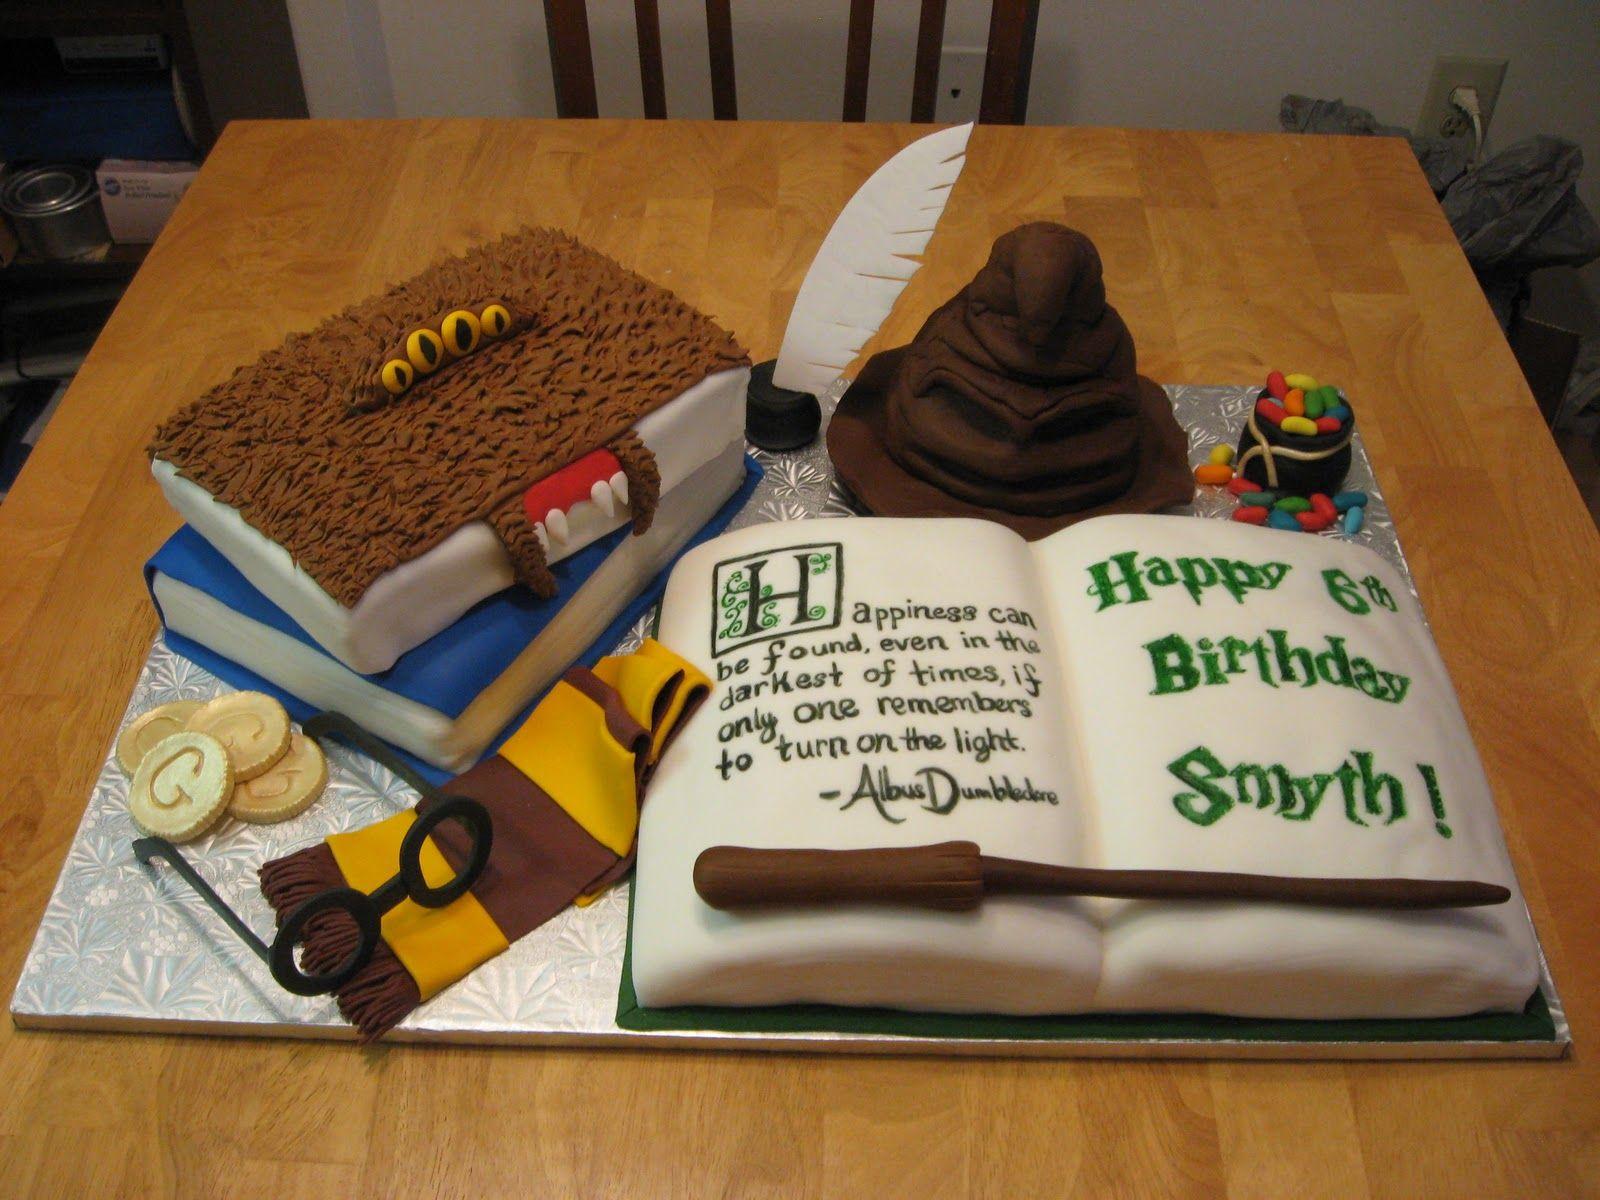 Superb Harry Potter Cake Topper 16001200 Dengan Gambar Funny Birthday Cards Online Inifofree Goldxyz